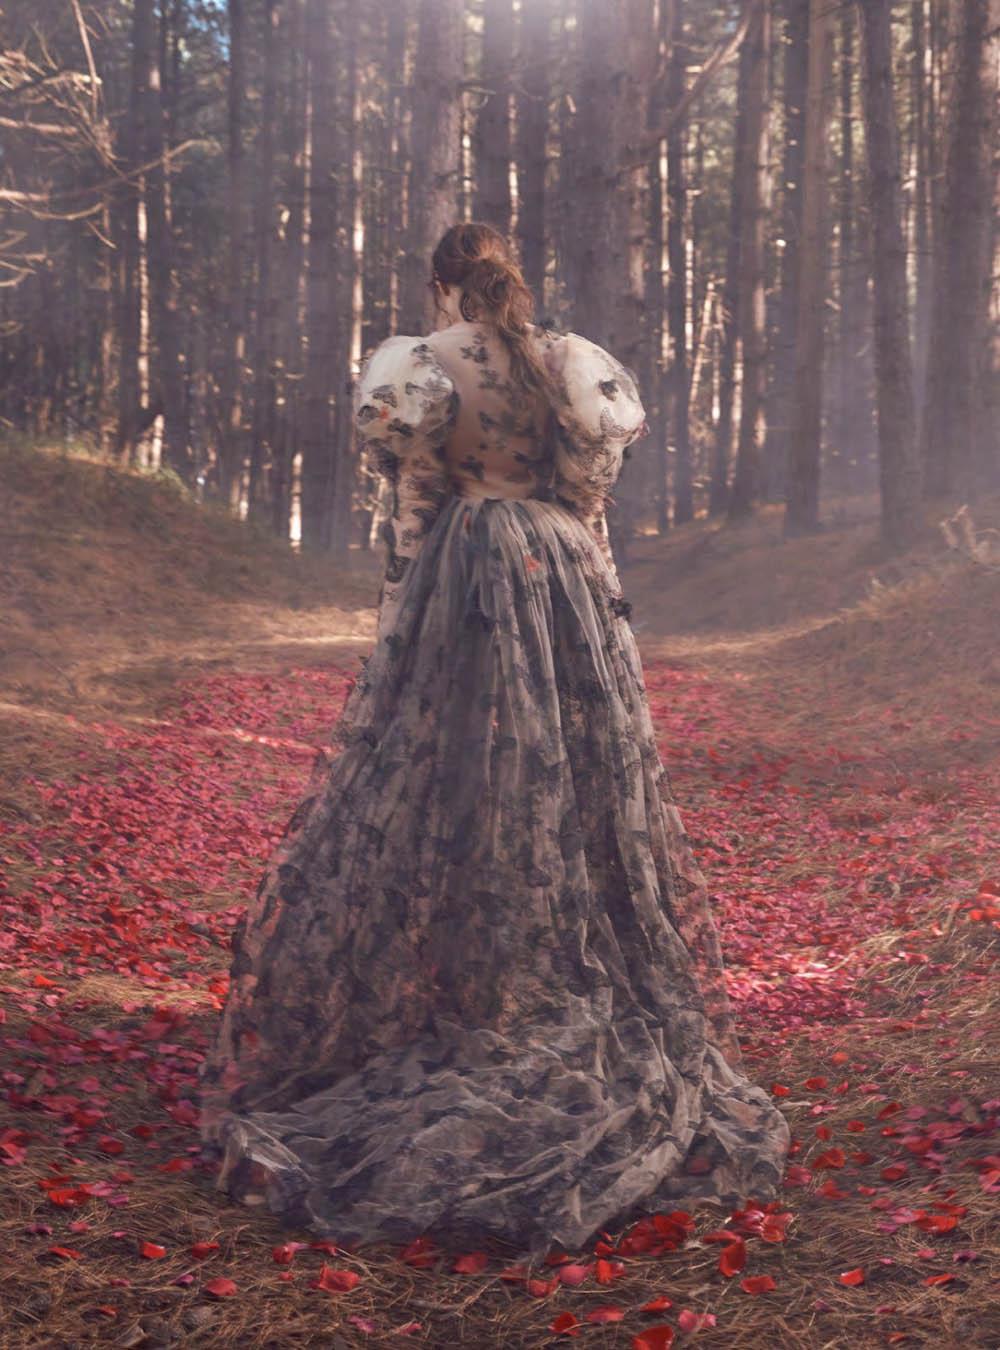 Kati Nescher by Richard Phibbs for Harper's Bazaar UK January 2019